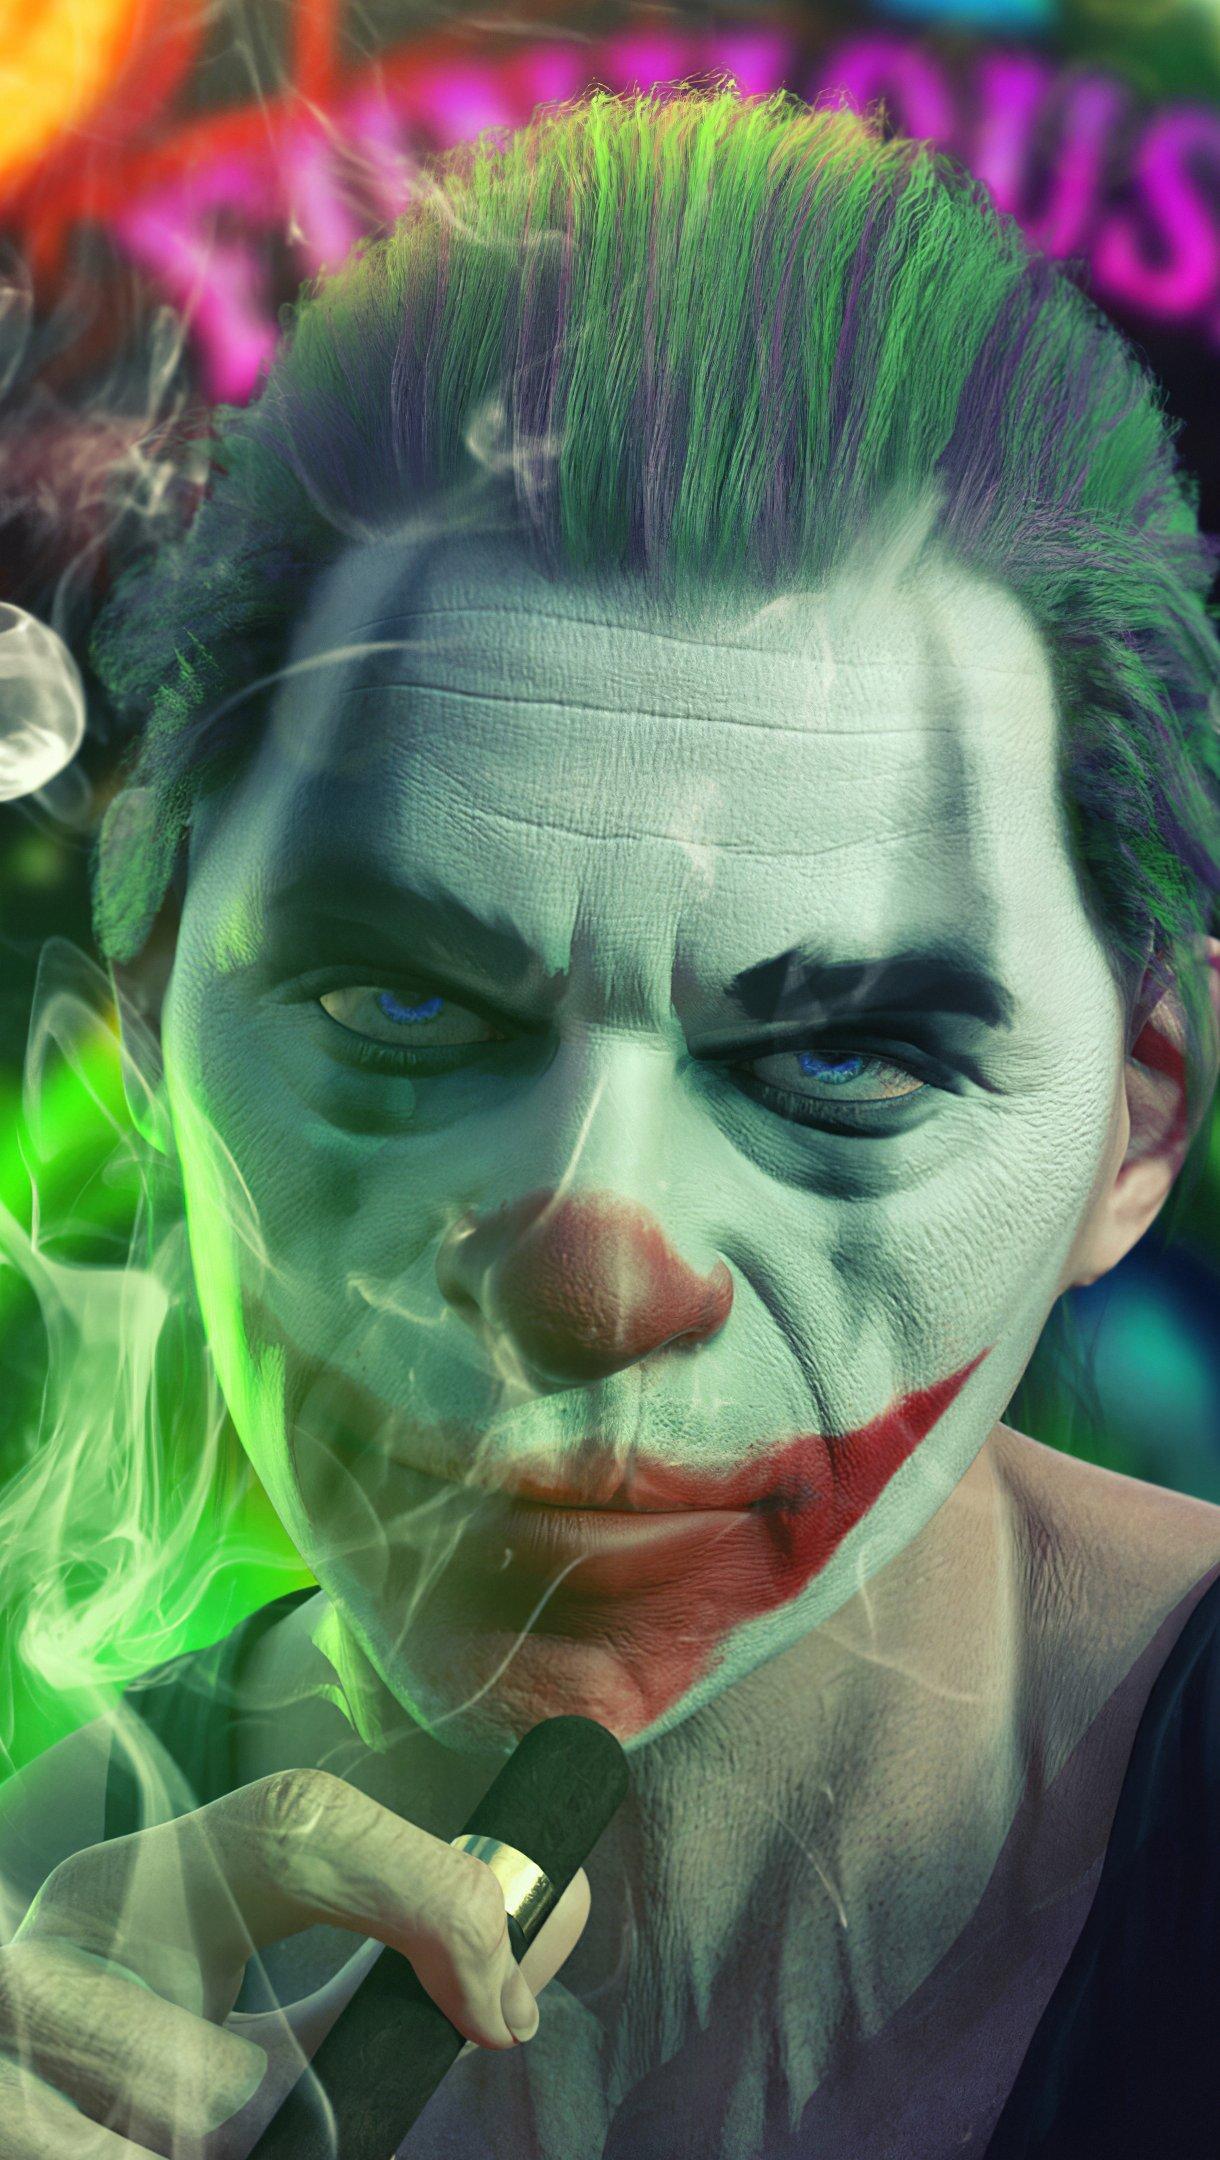 Joker smoking Wallpaper 4k Ultra HD ID:5172